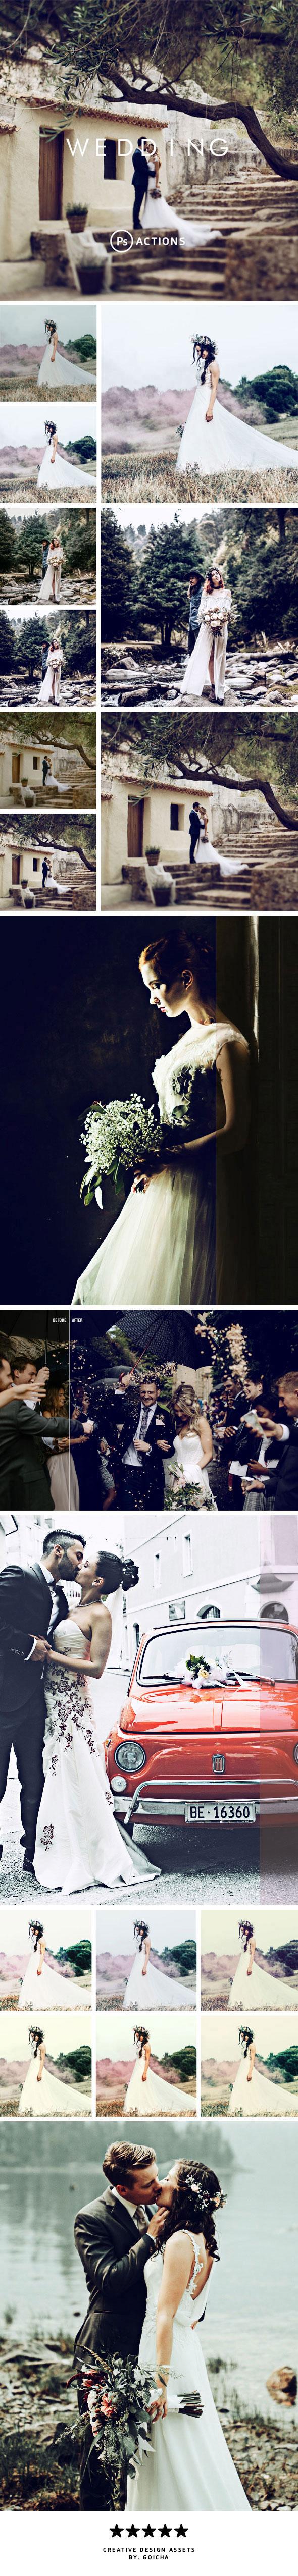 Wedding - Photoshop Actions - Actions Photoshop